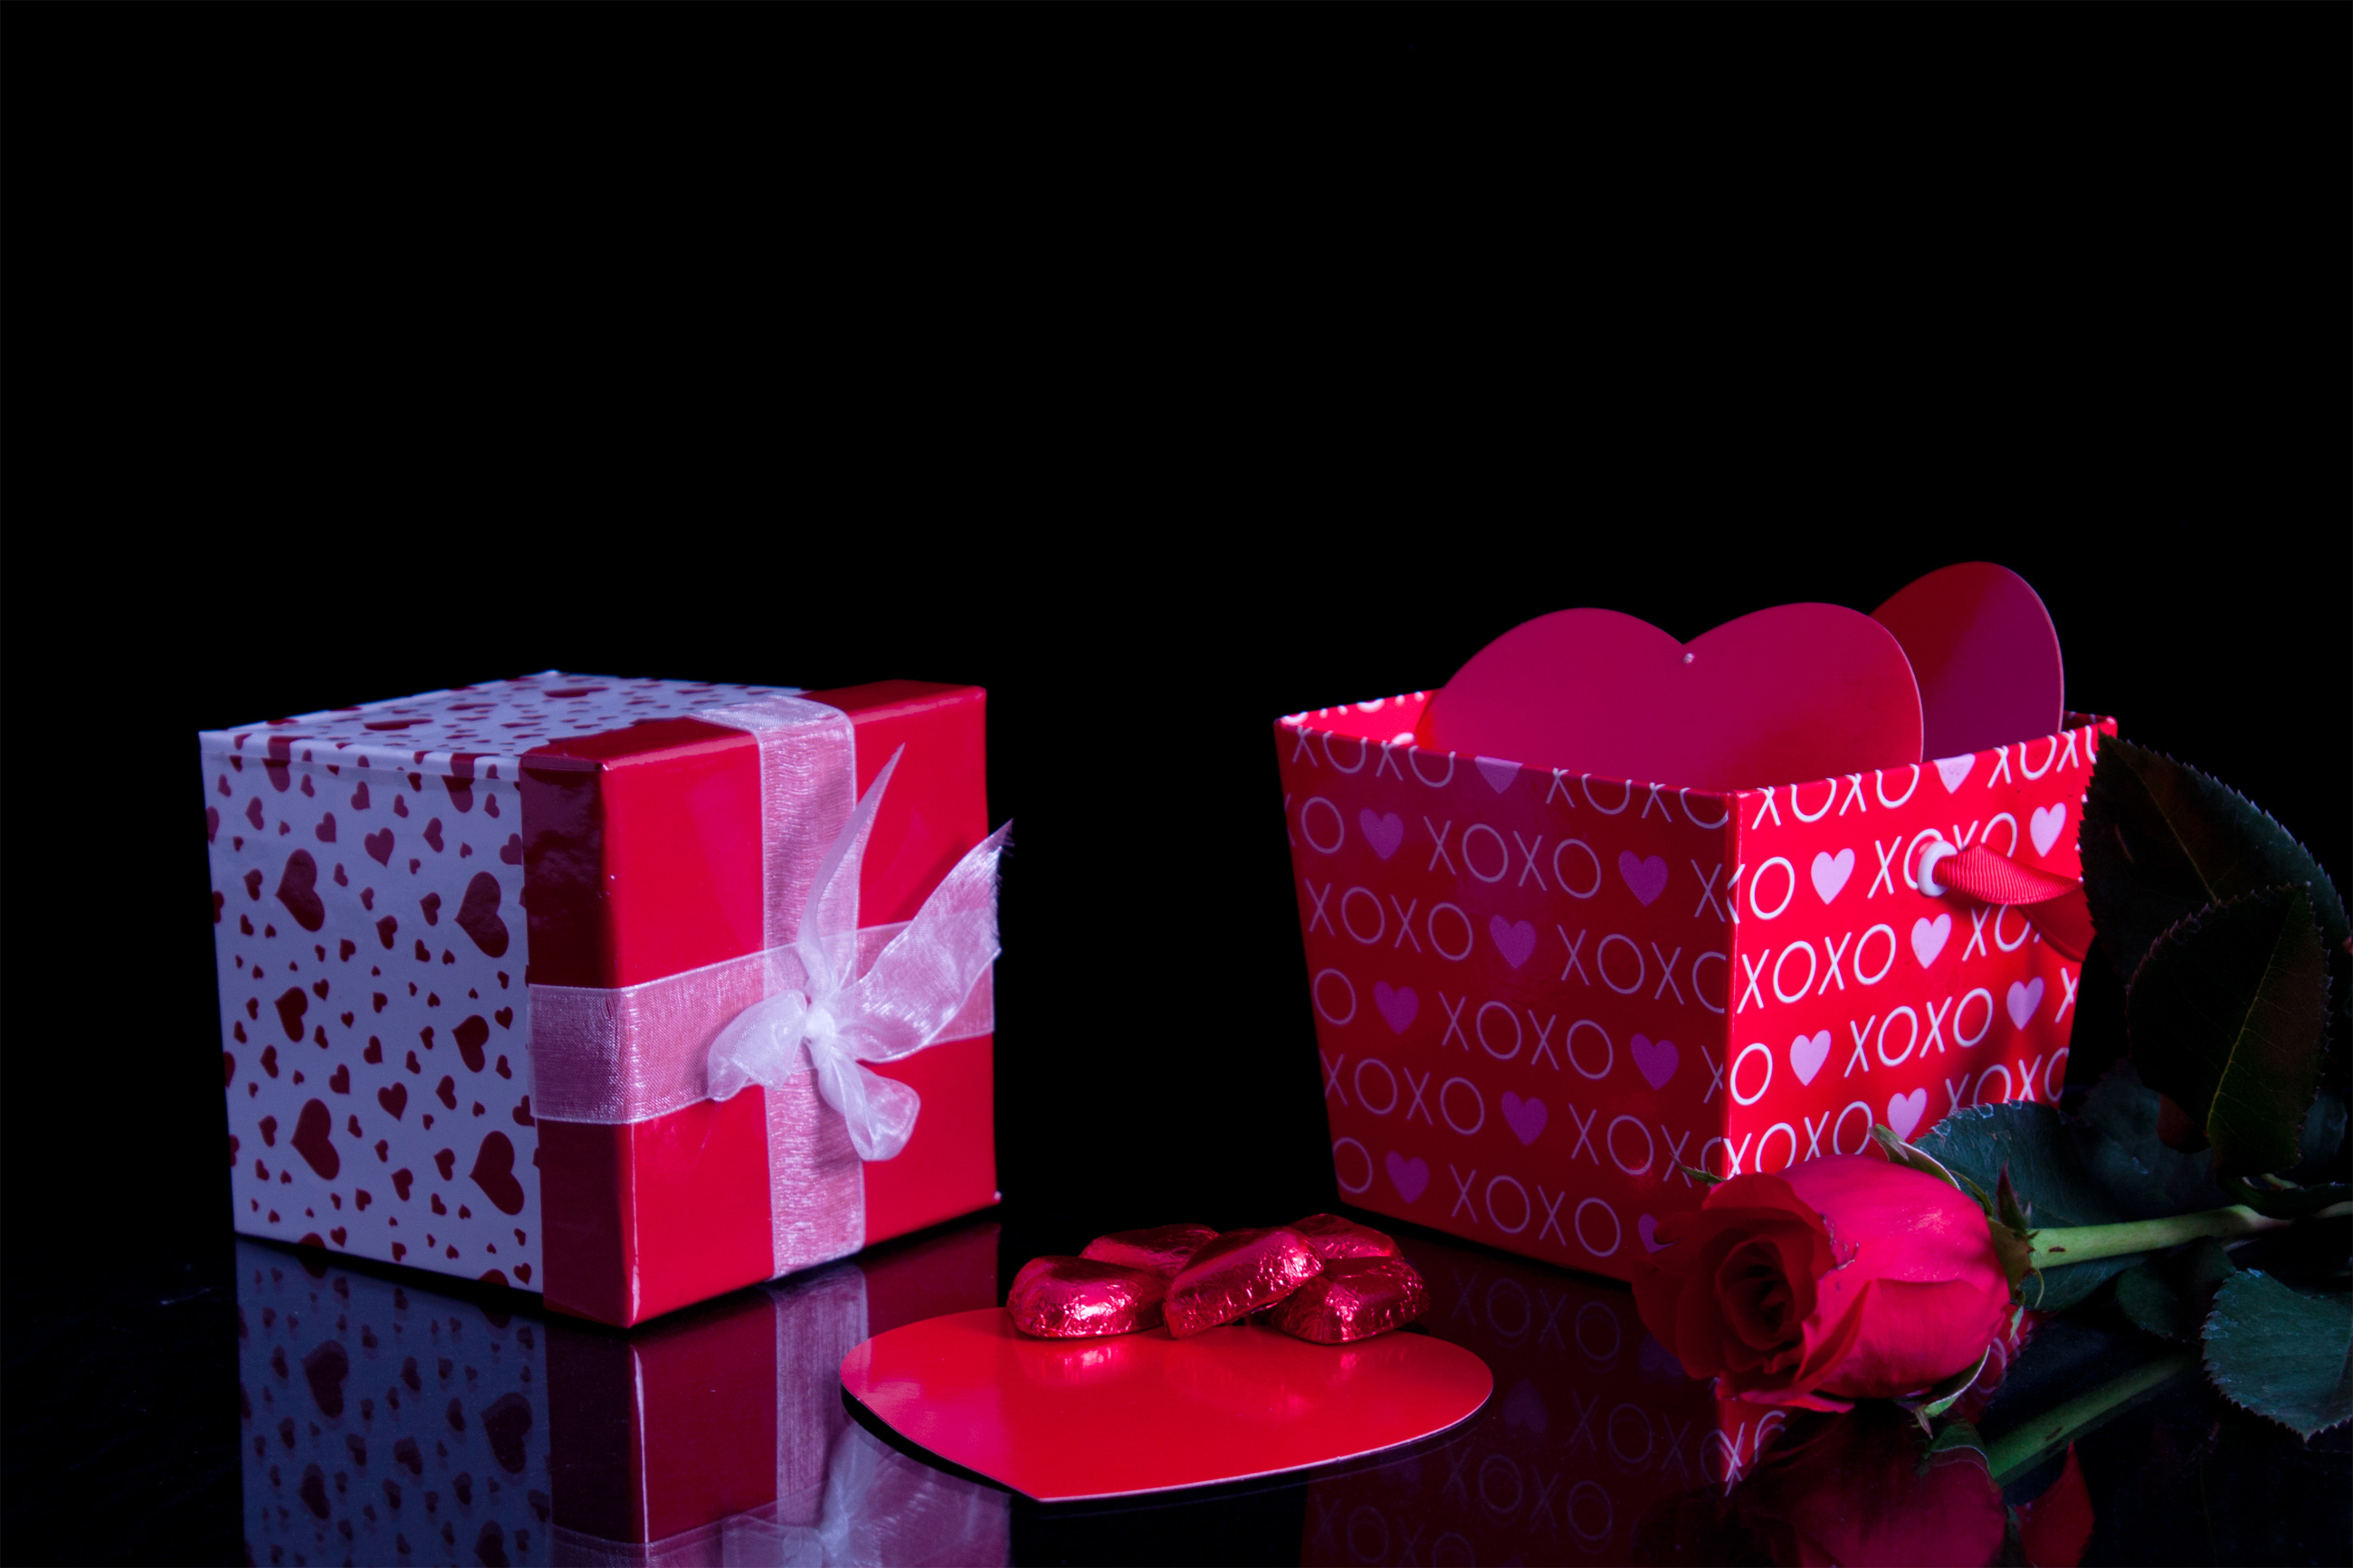 Love and Romance, Arrangement, Romance, Isolated, Love, HQ Photo